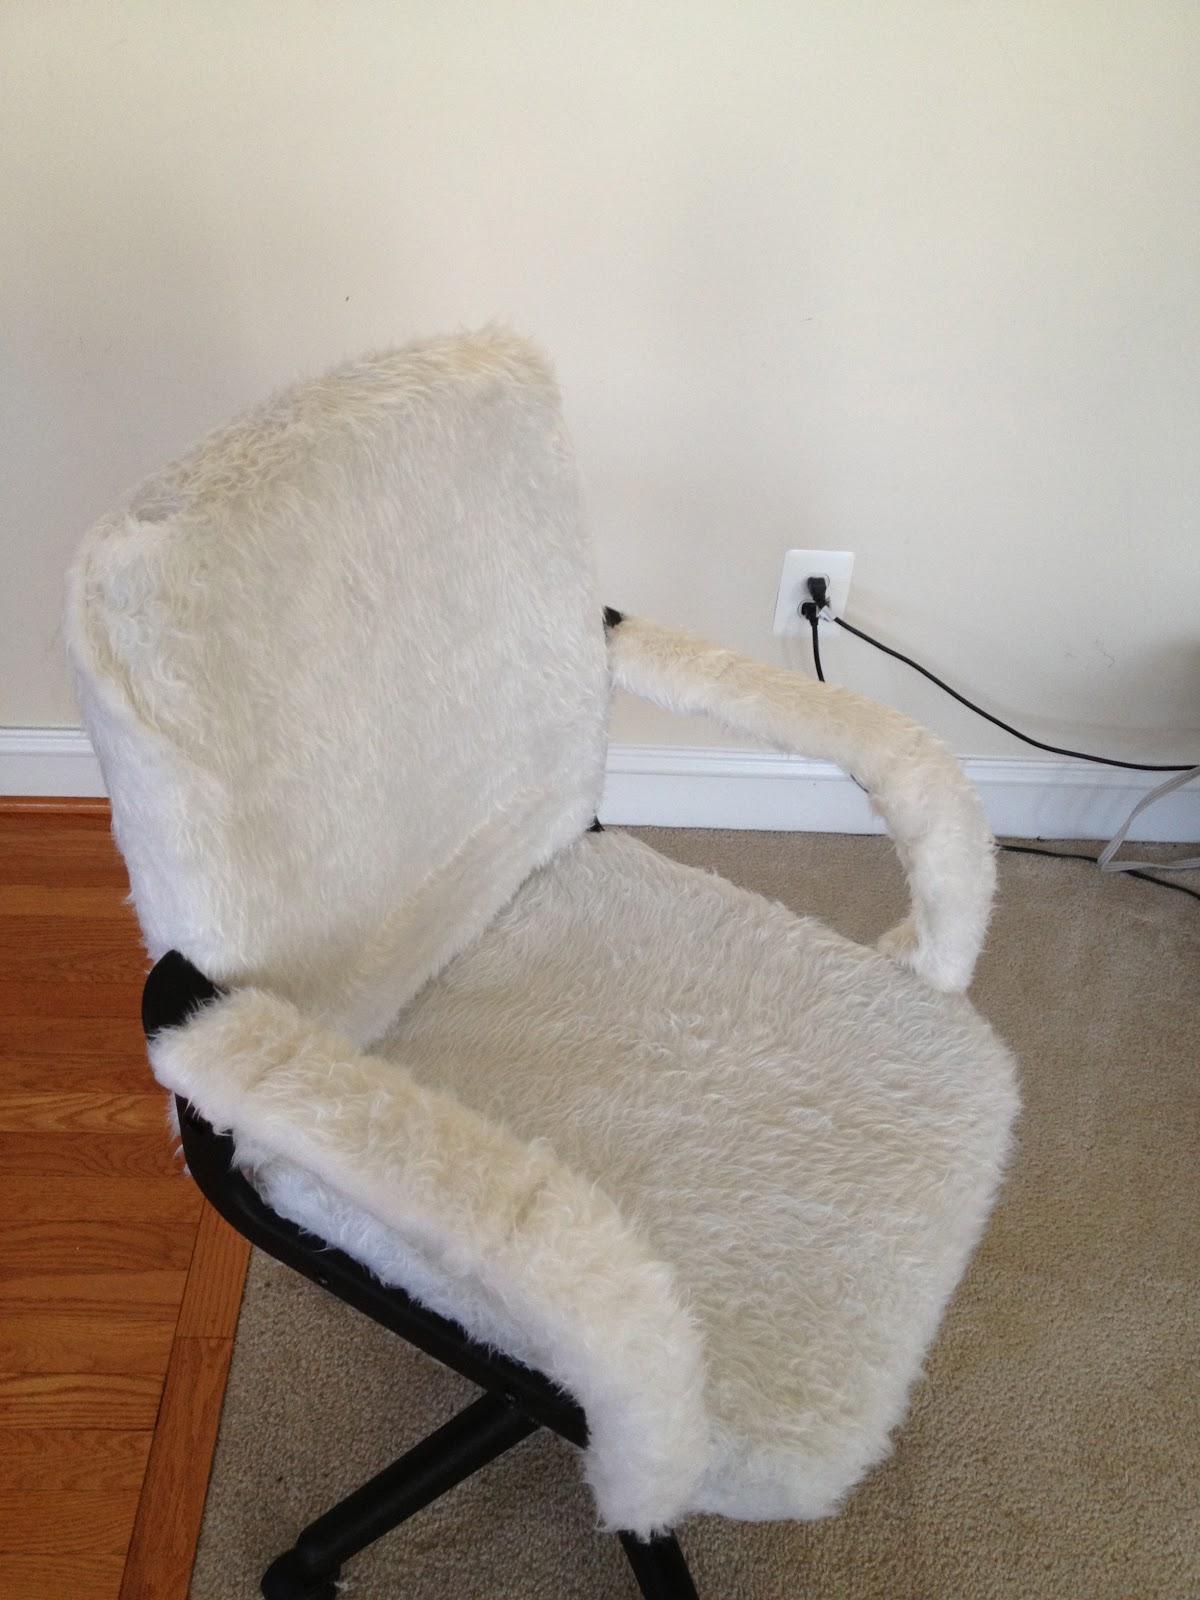 Reupholster Office Chair Back Zebra Dining Chairs An Luxe Millennial